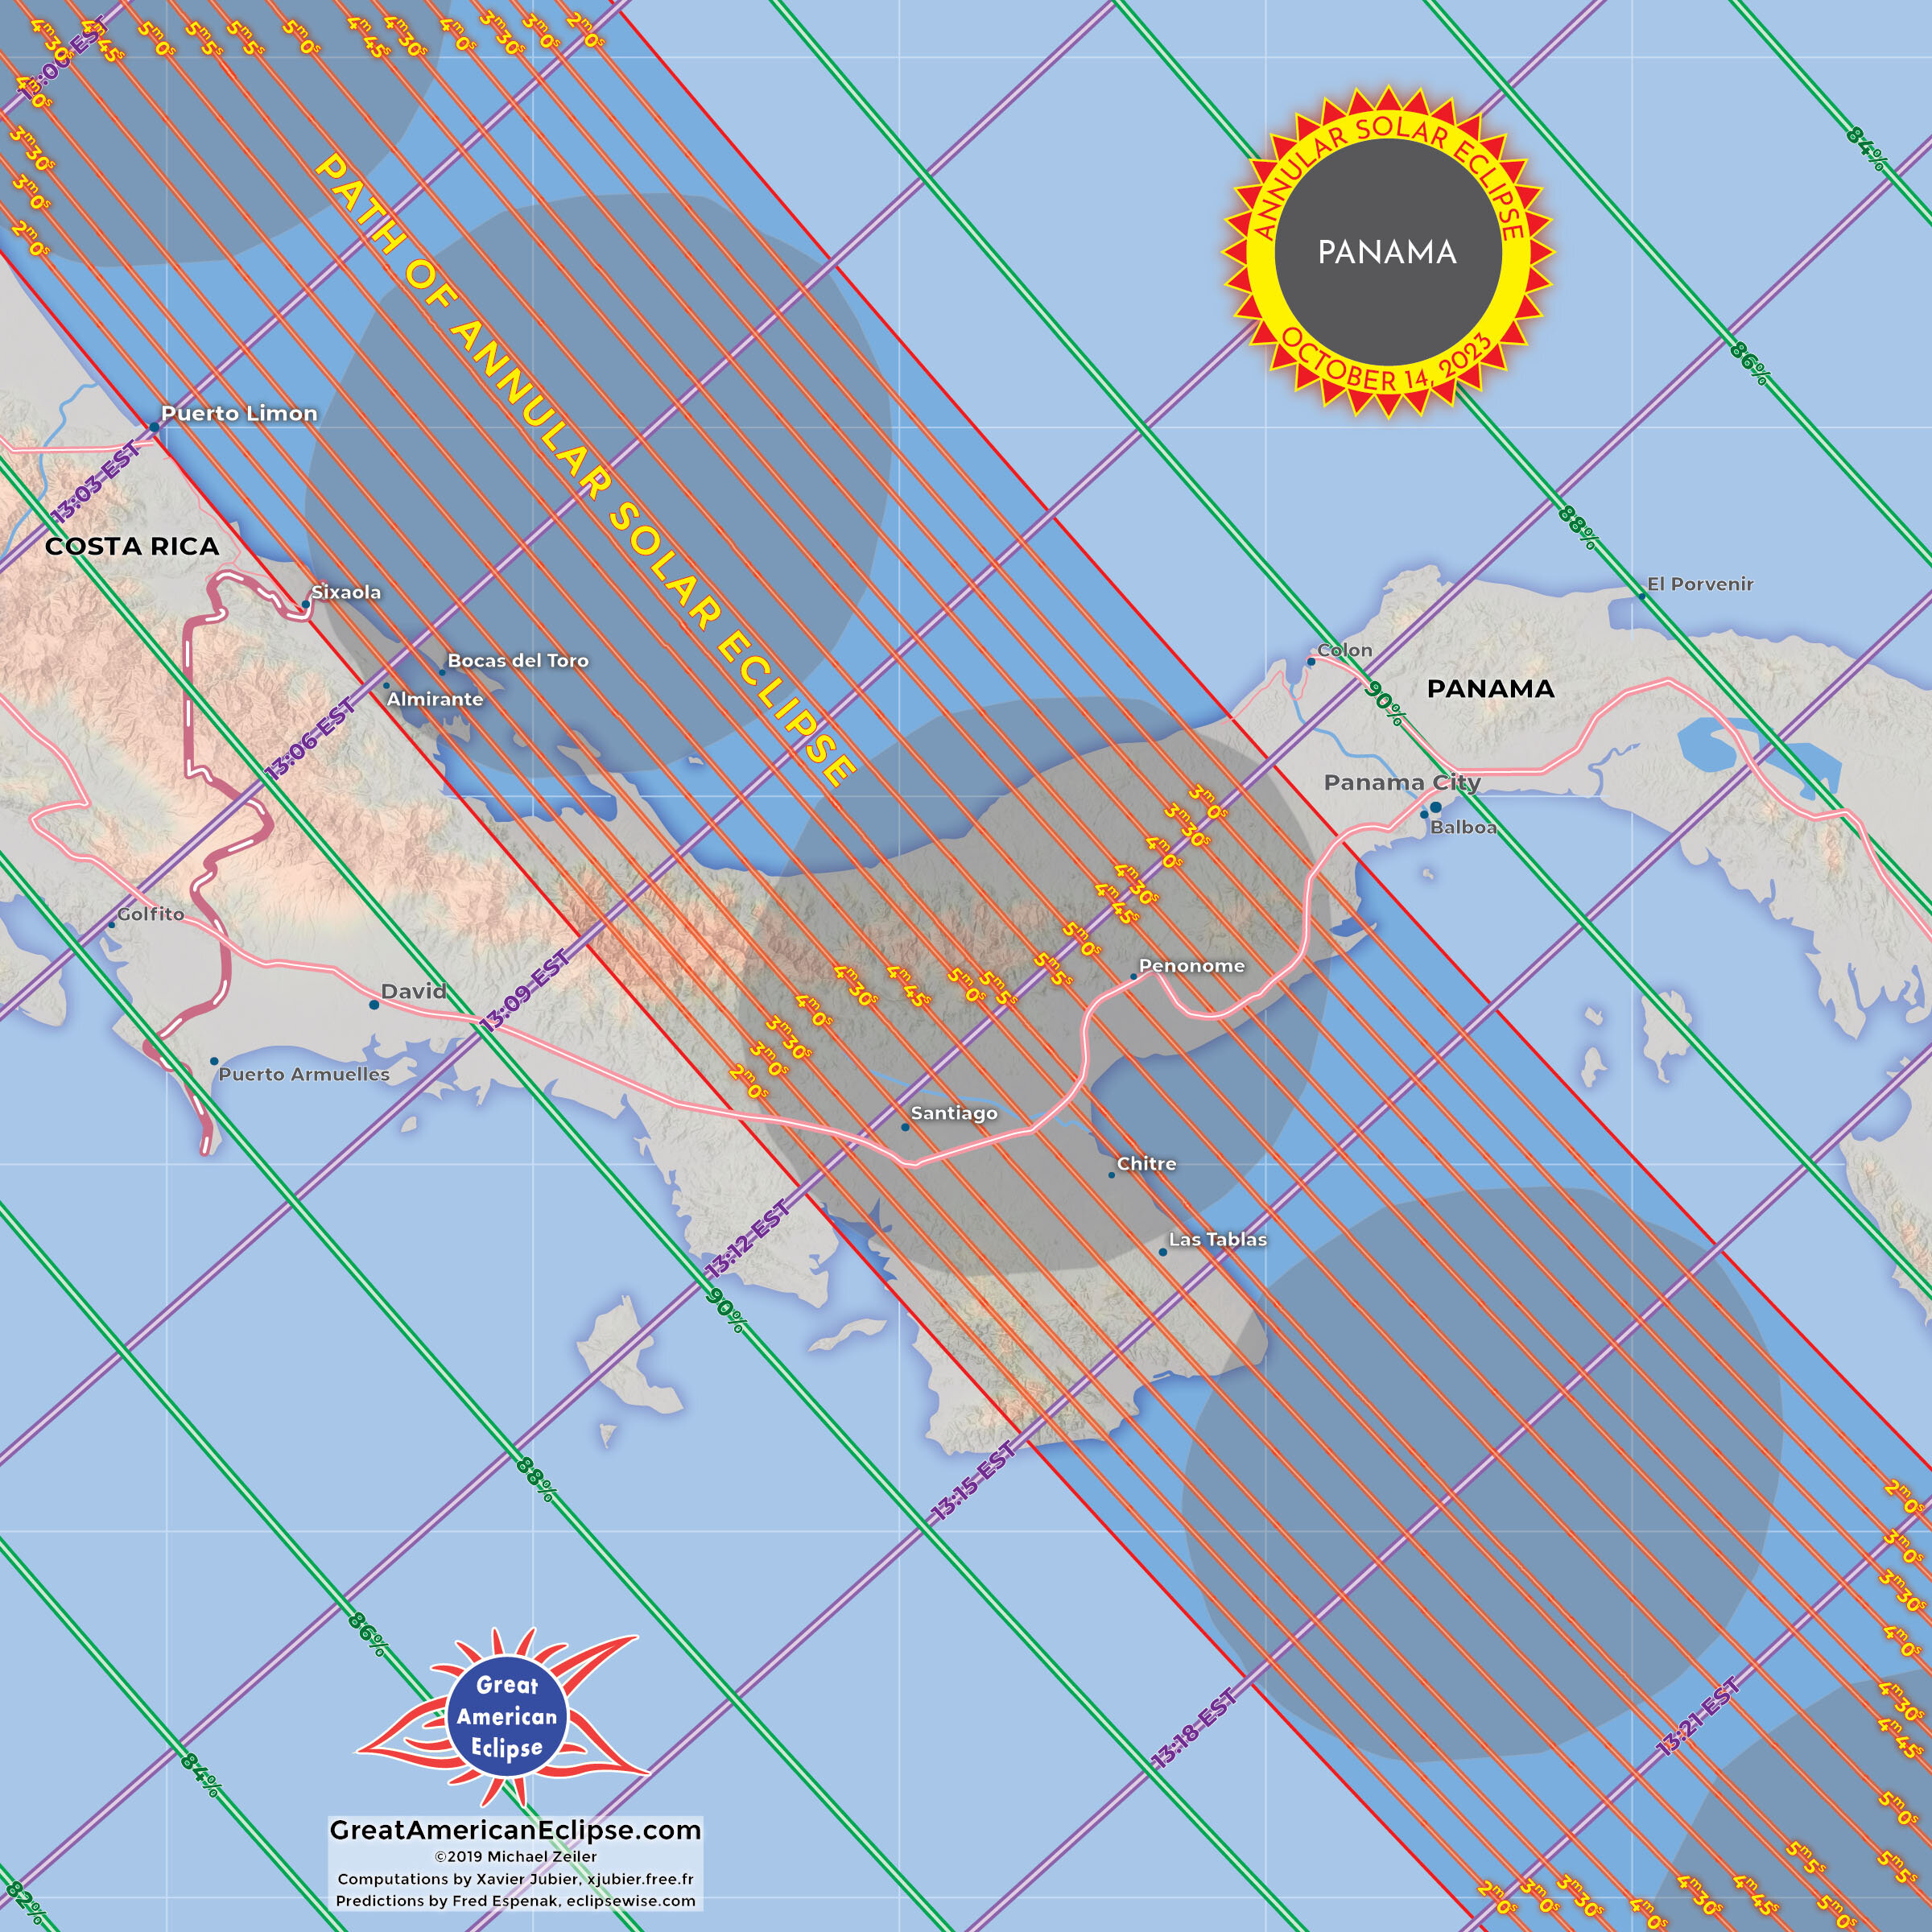 ASE_2023_Panama.jpg